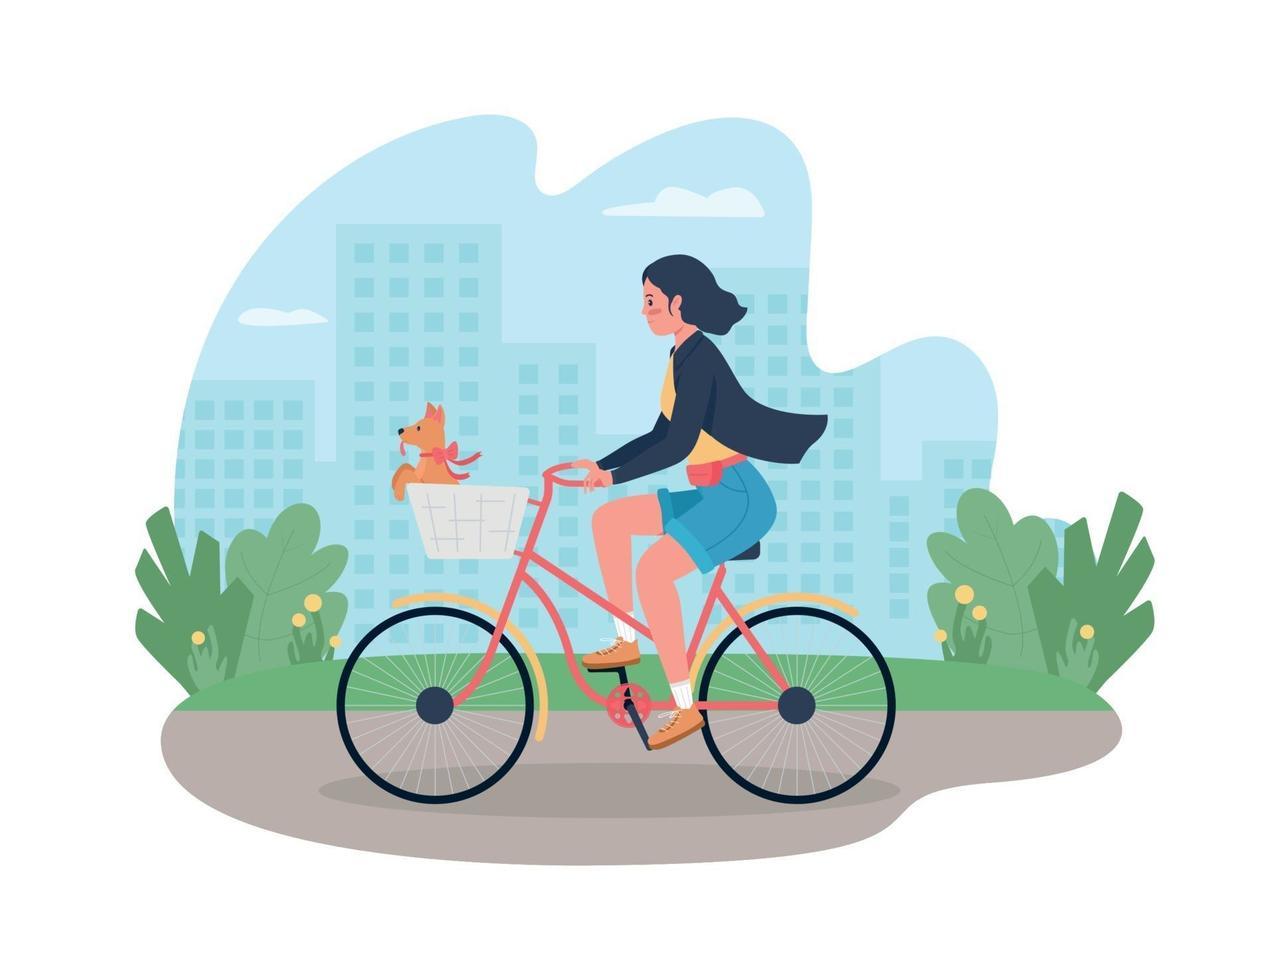 kvinna på cykel med hund i korg 2d vektor webb banner, affisch